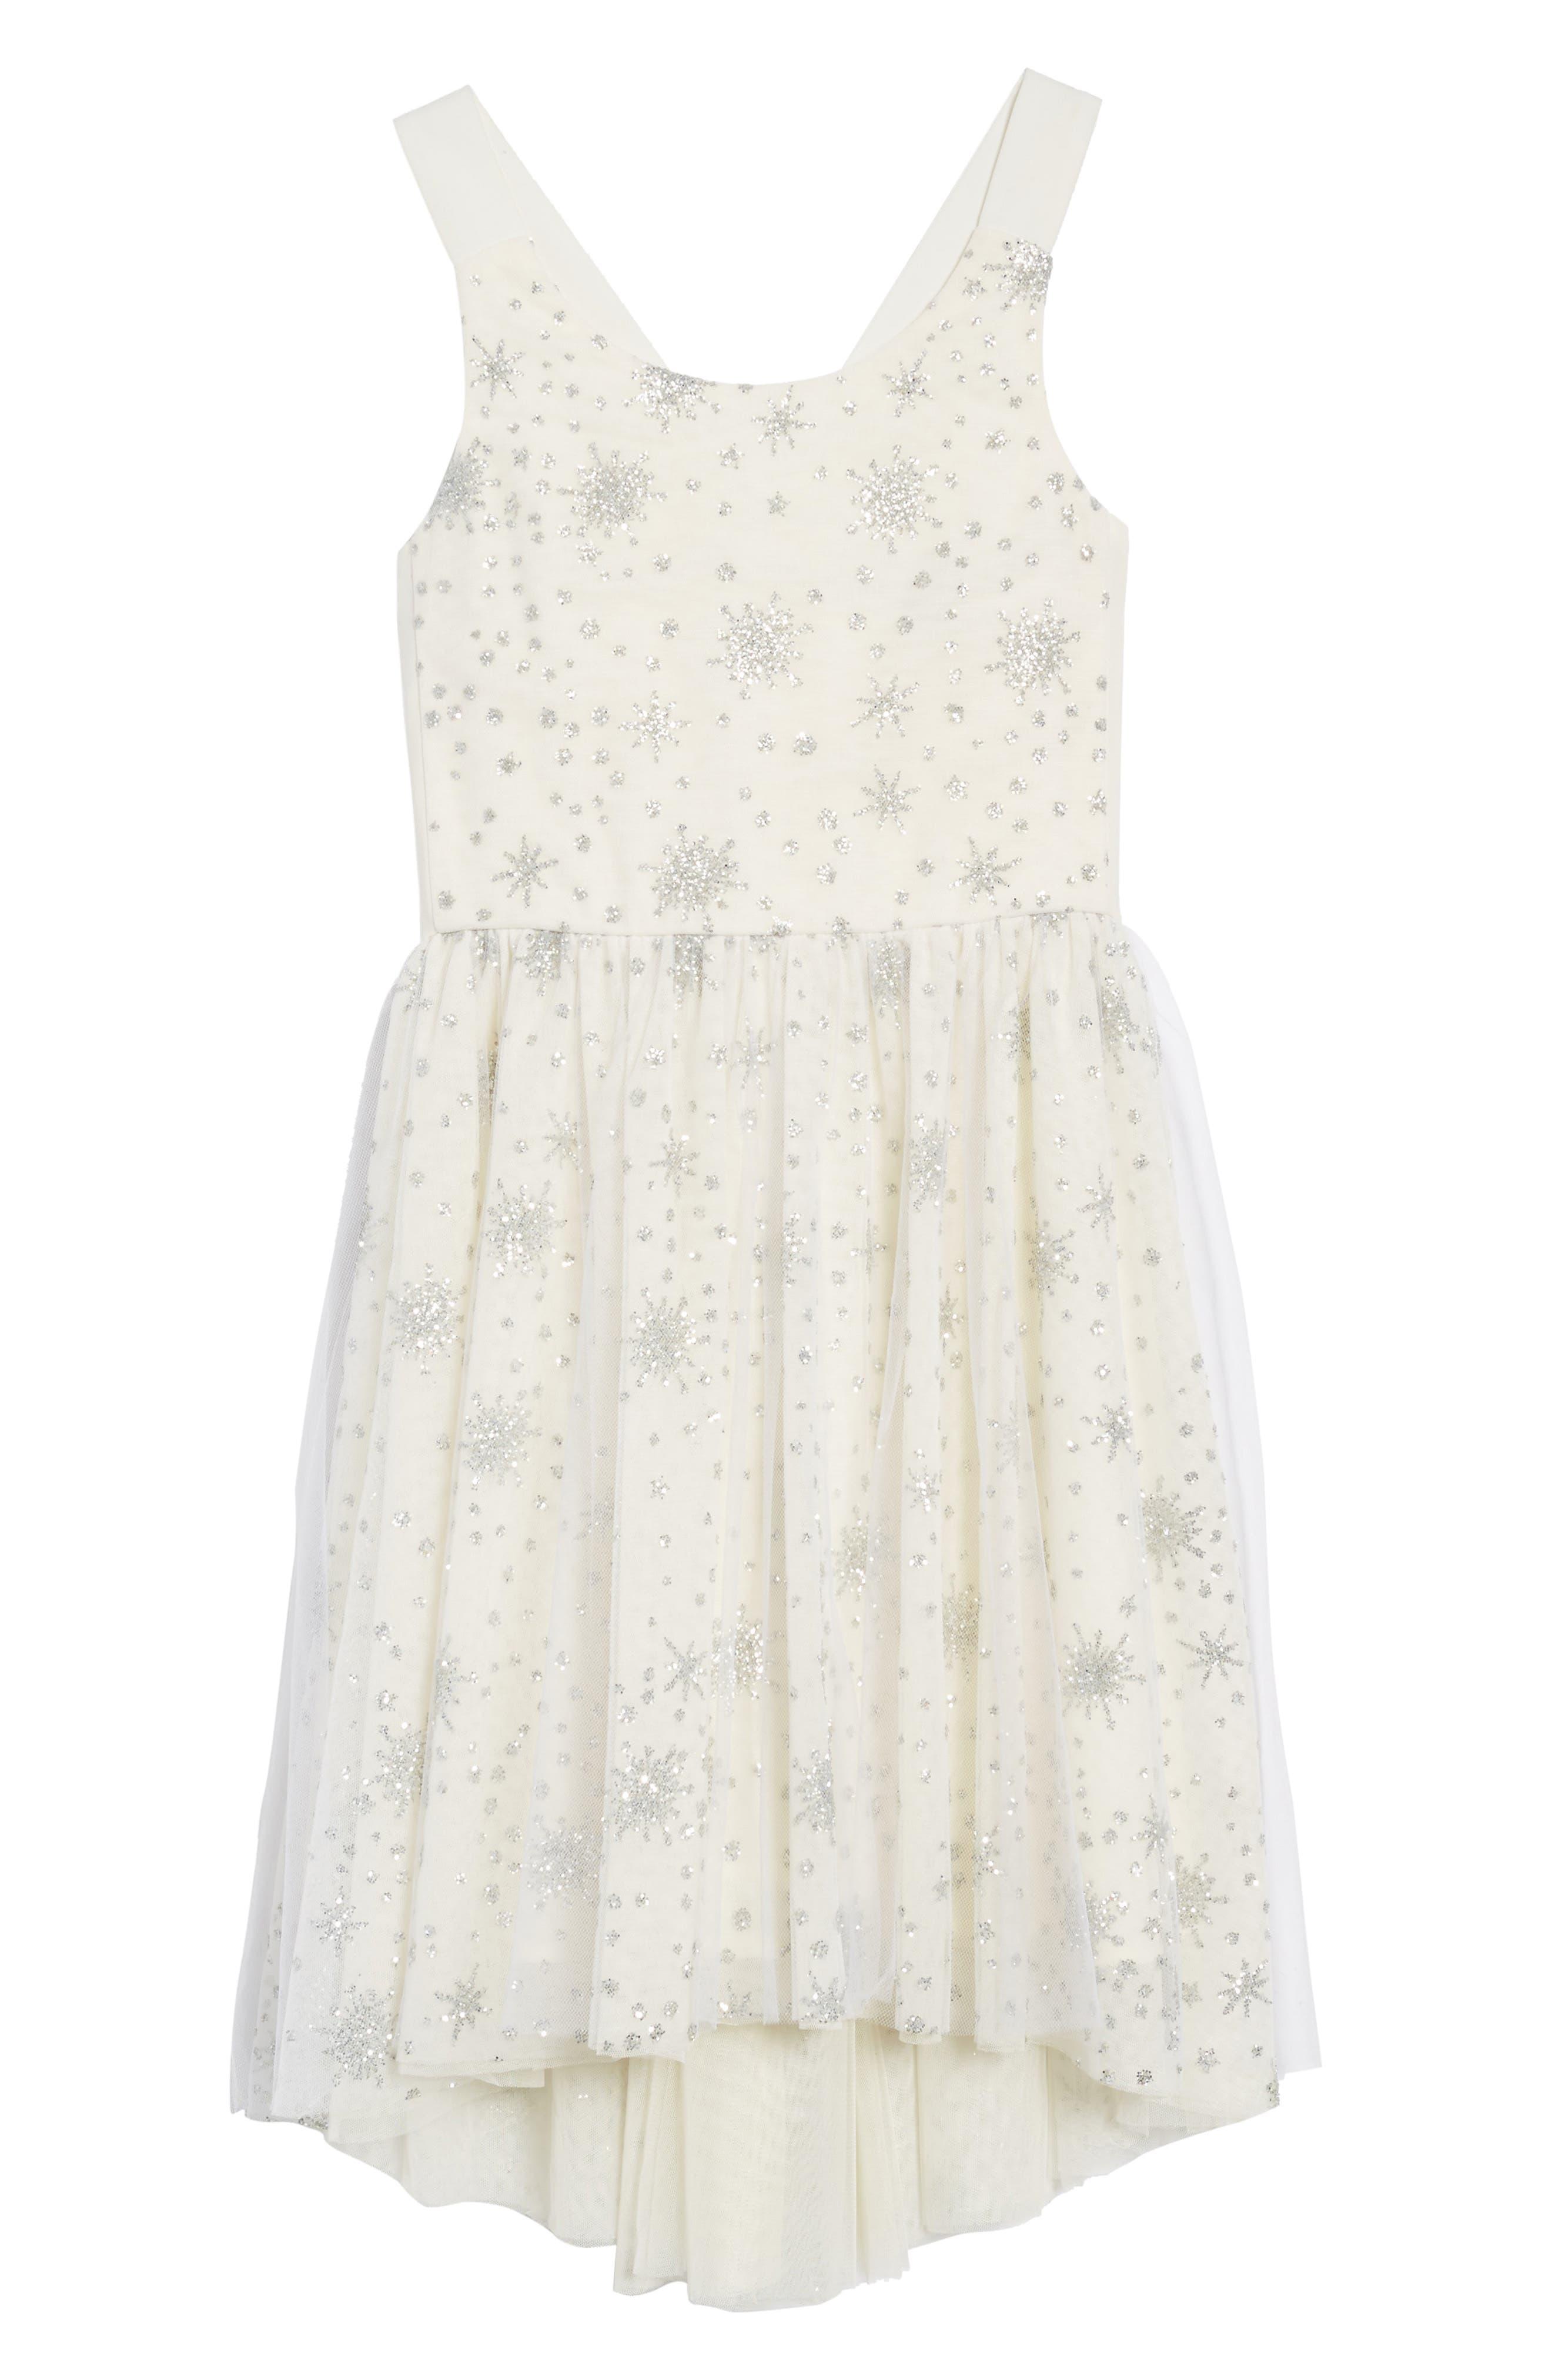 Winter Sparkle Dress,                             Main thumbnail 1, color,                             Cream